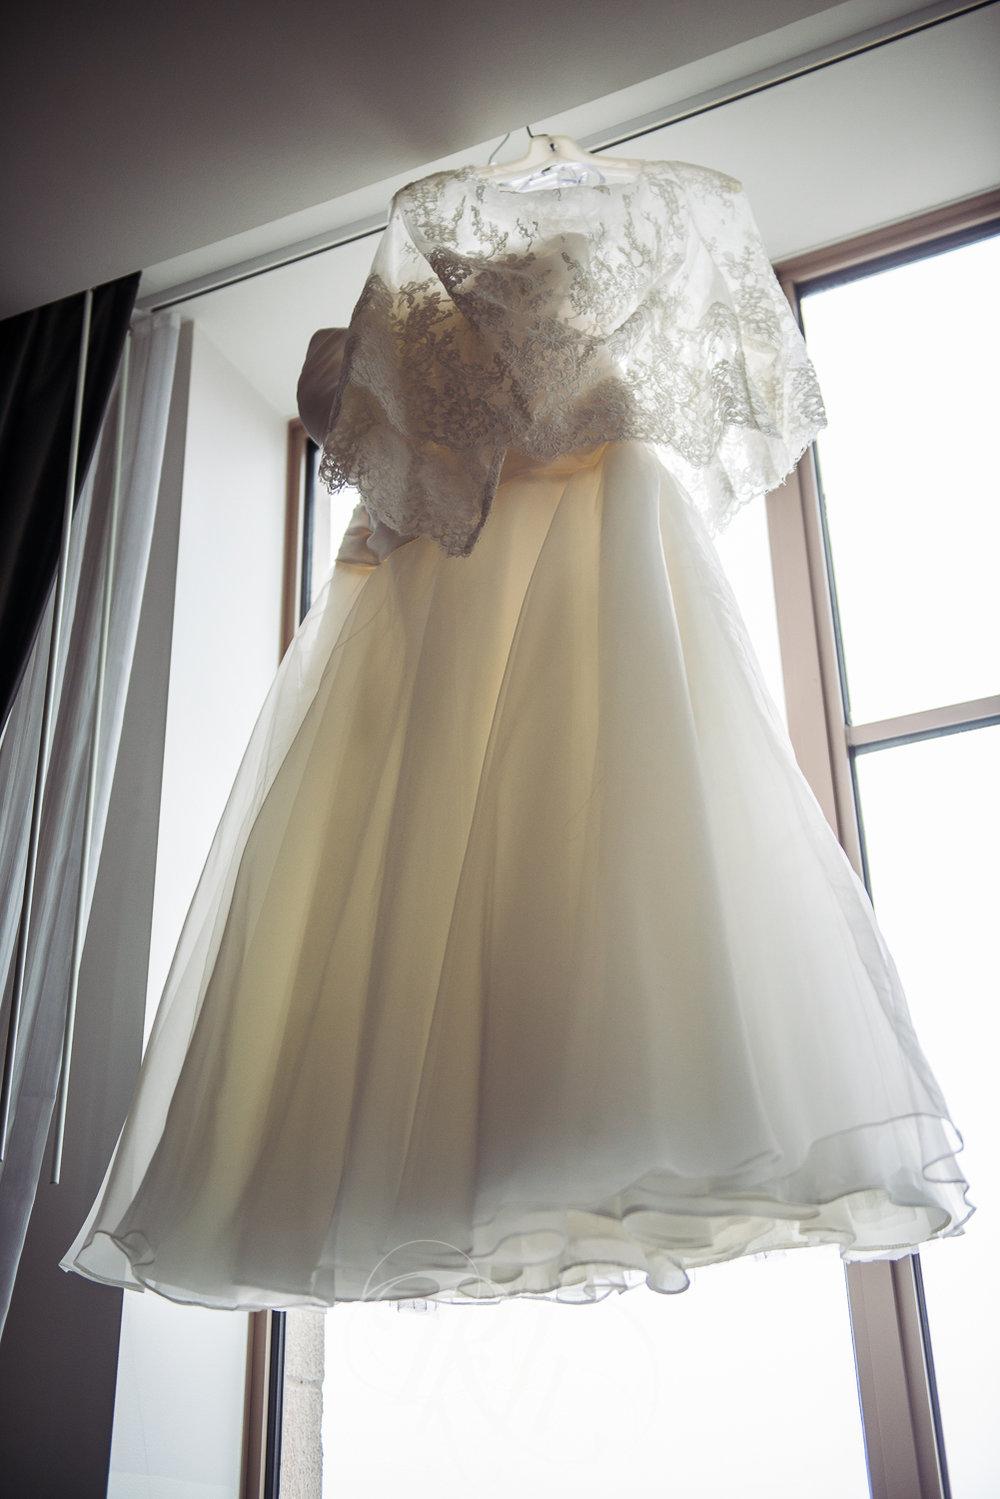 Beth & Clarissa - Minnesota LGBT Wedding Photography - RKH Images - Blog -3.jpg